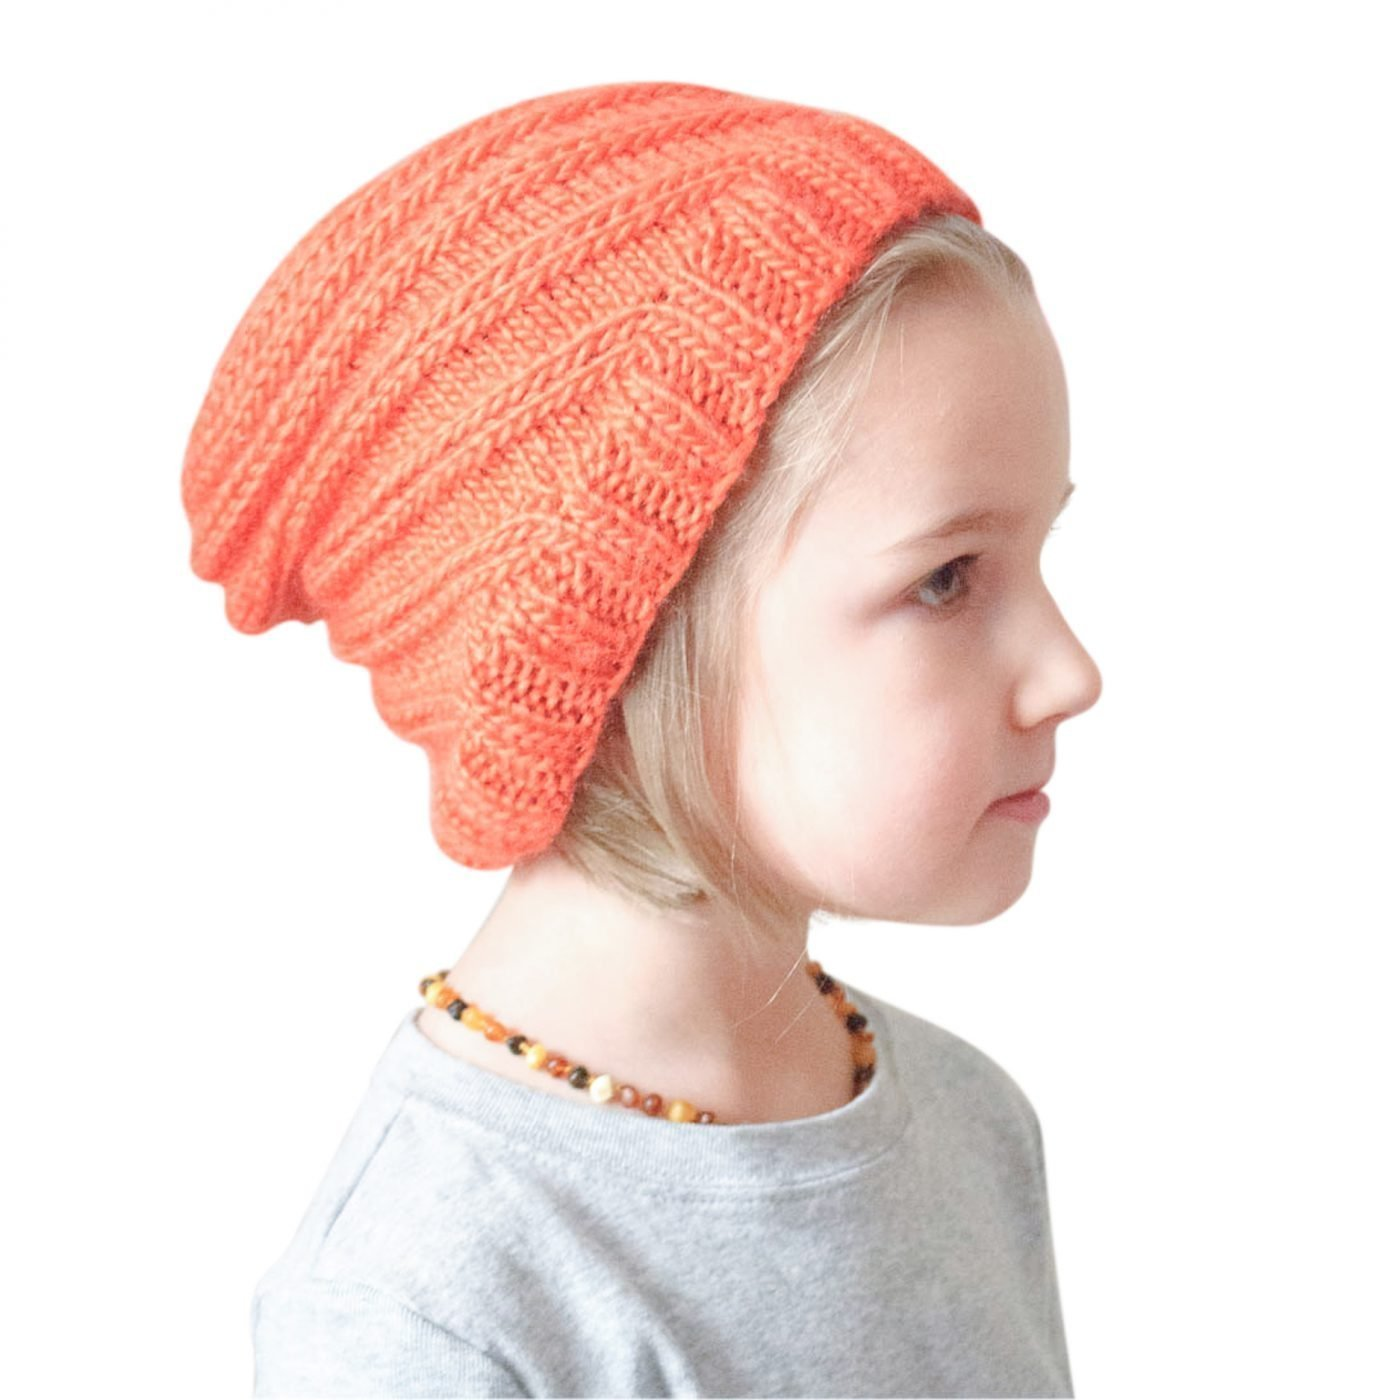 The Graham Hat Knitting Pattern